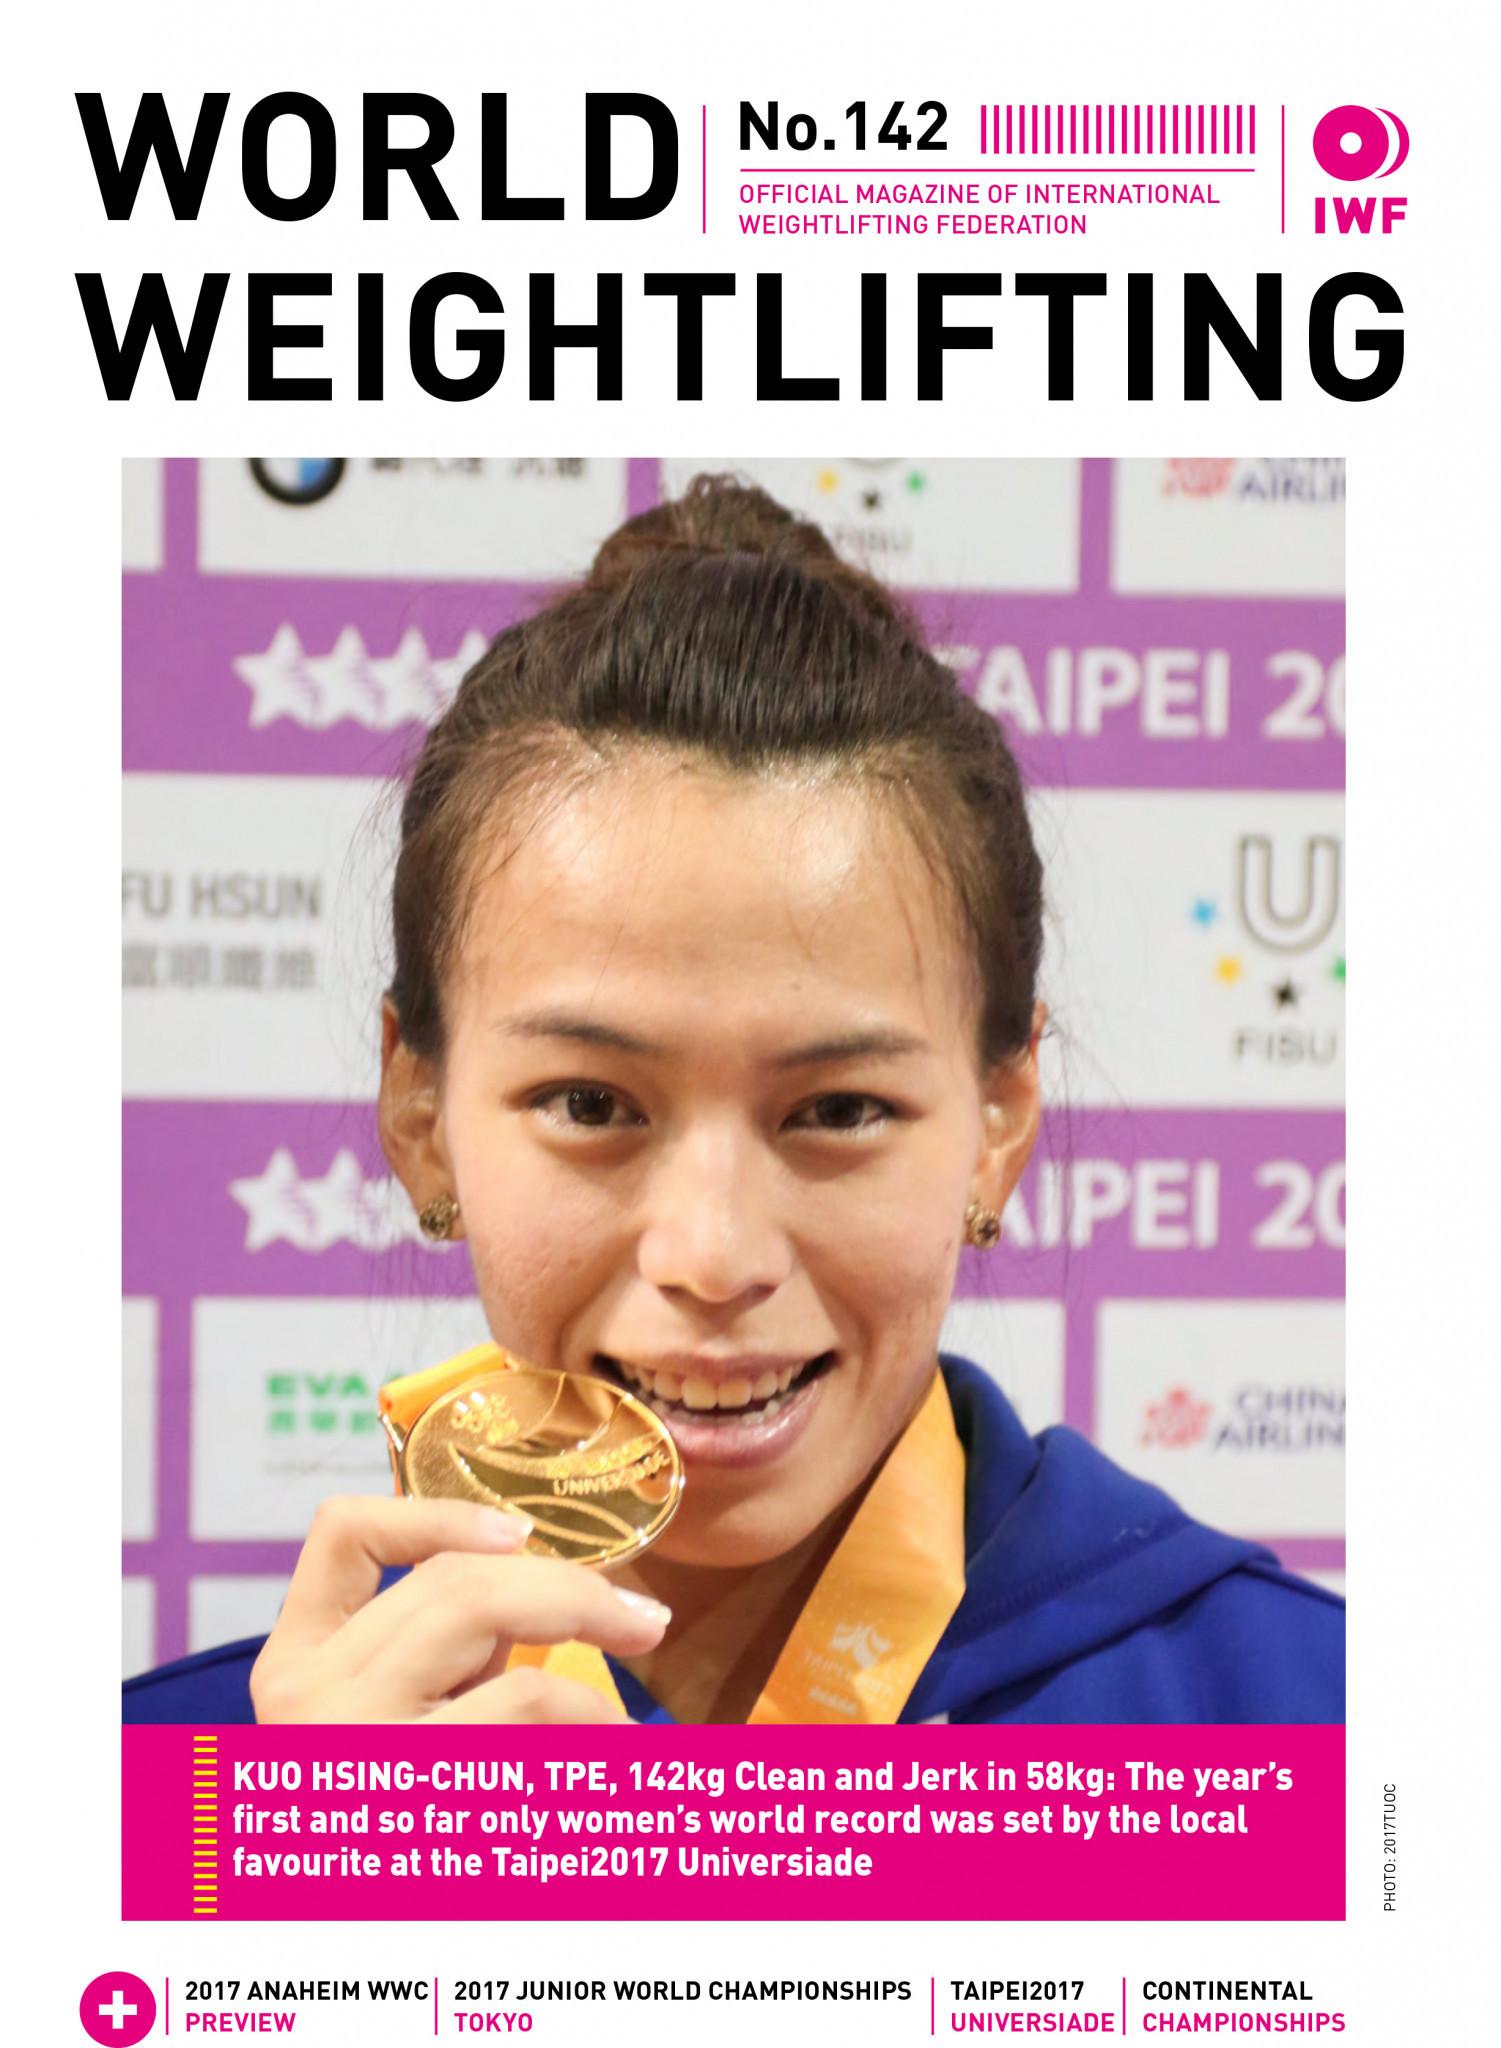 World Weightlifting Magazine No. 142